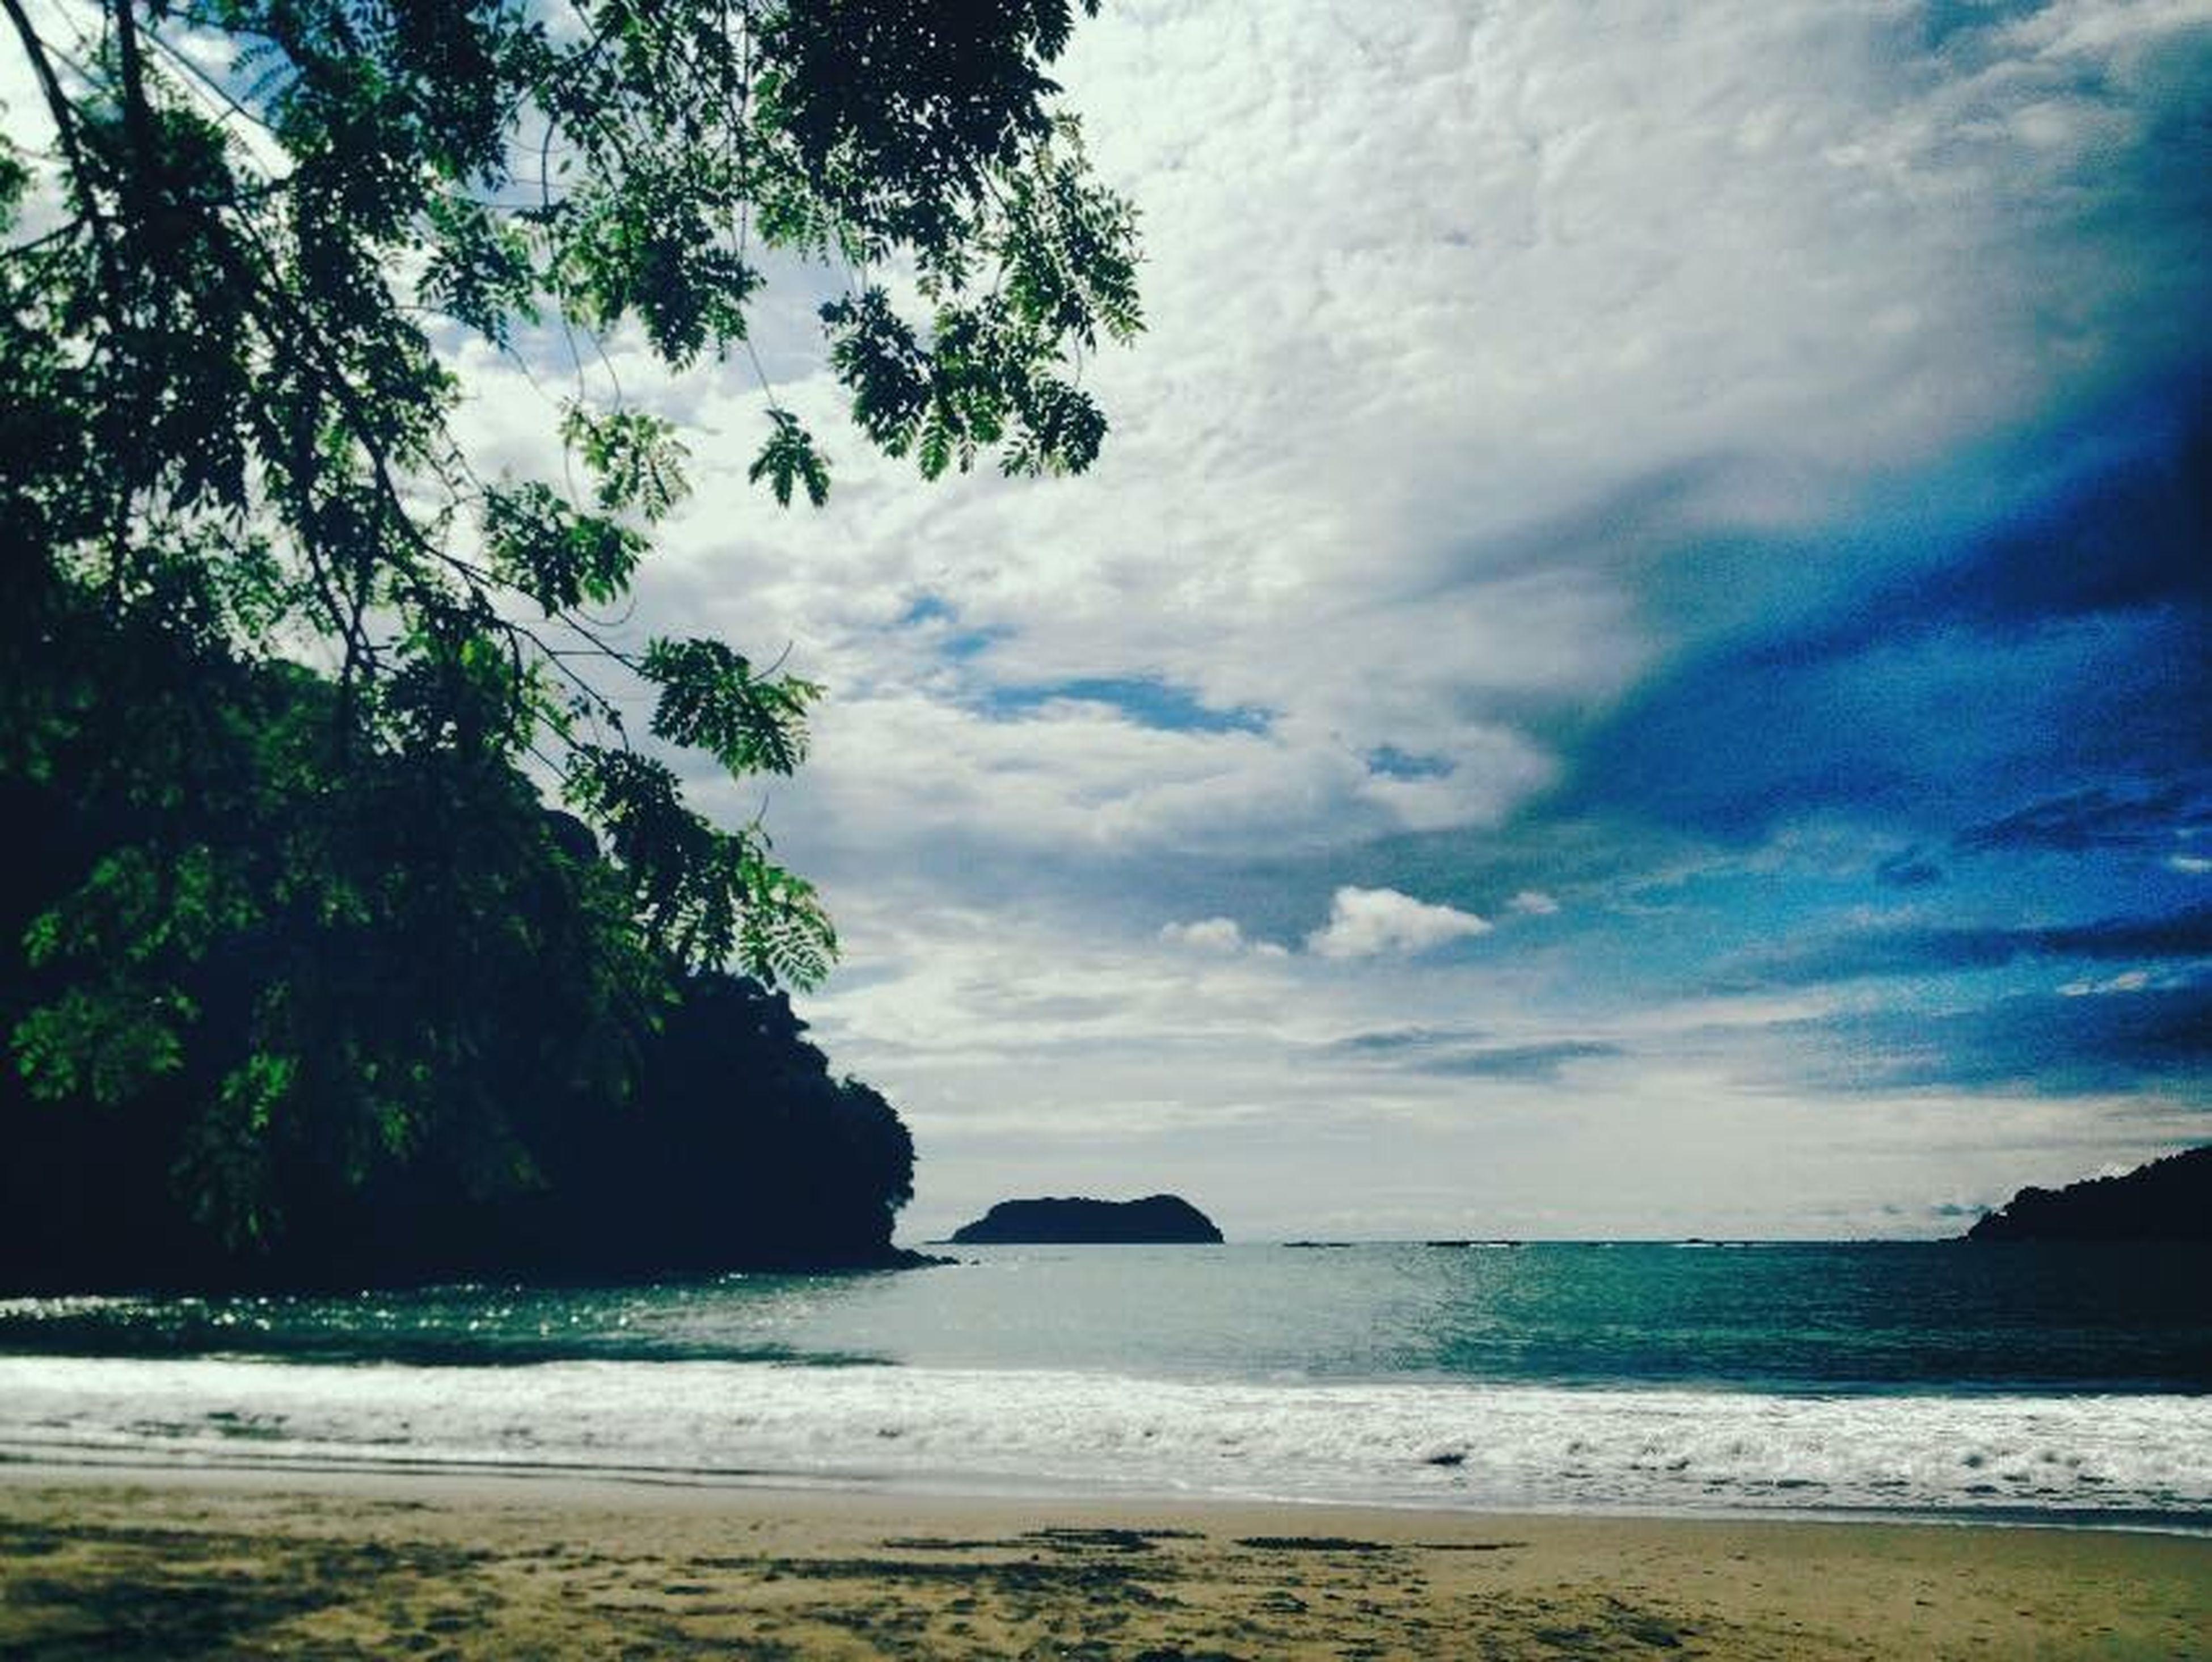 sea, water, sky, beach, tranquil scene, scenics, tranquility, horizon over water, beauty in nature, shore, cloud - sky, tree, nature, cloud, idyllic, cloudy, sand, coastline, outdoors, non-urban scene